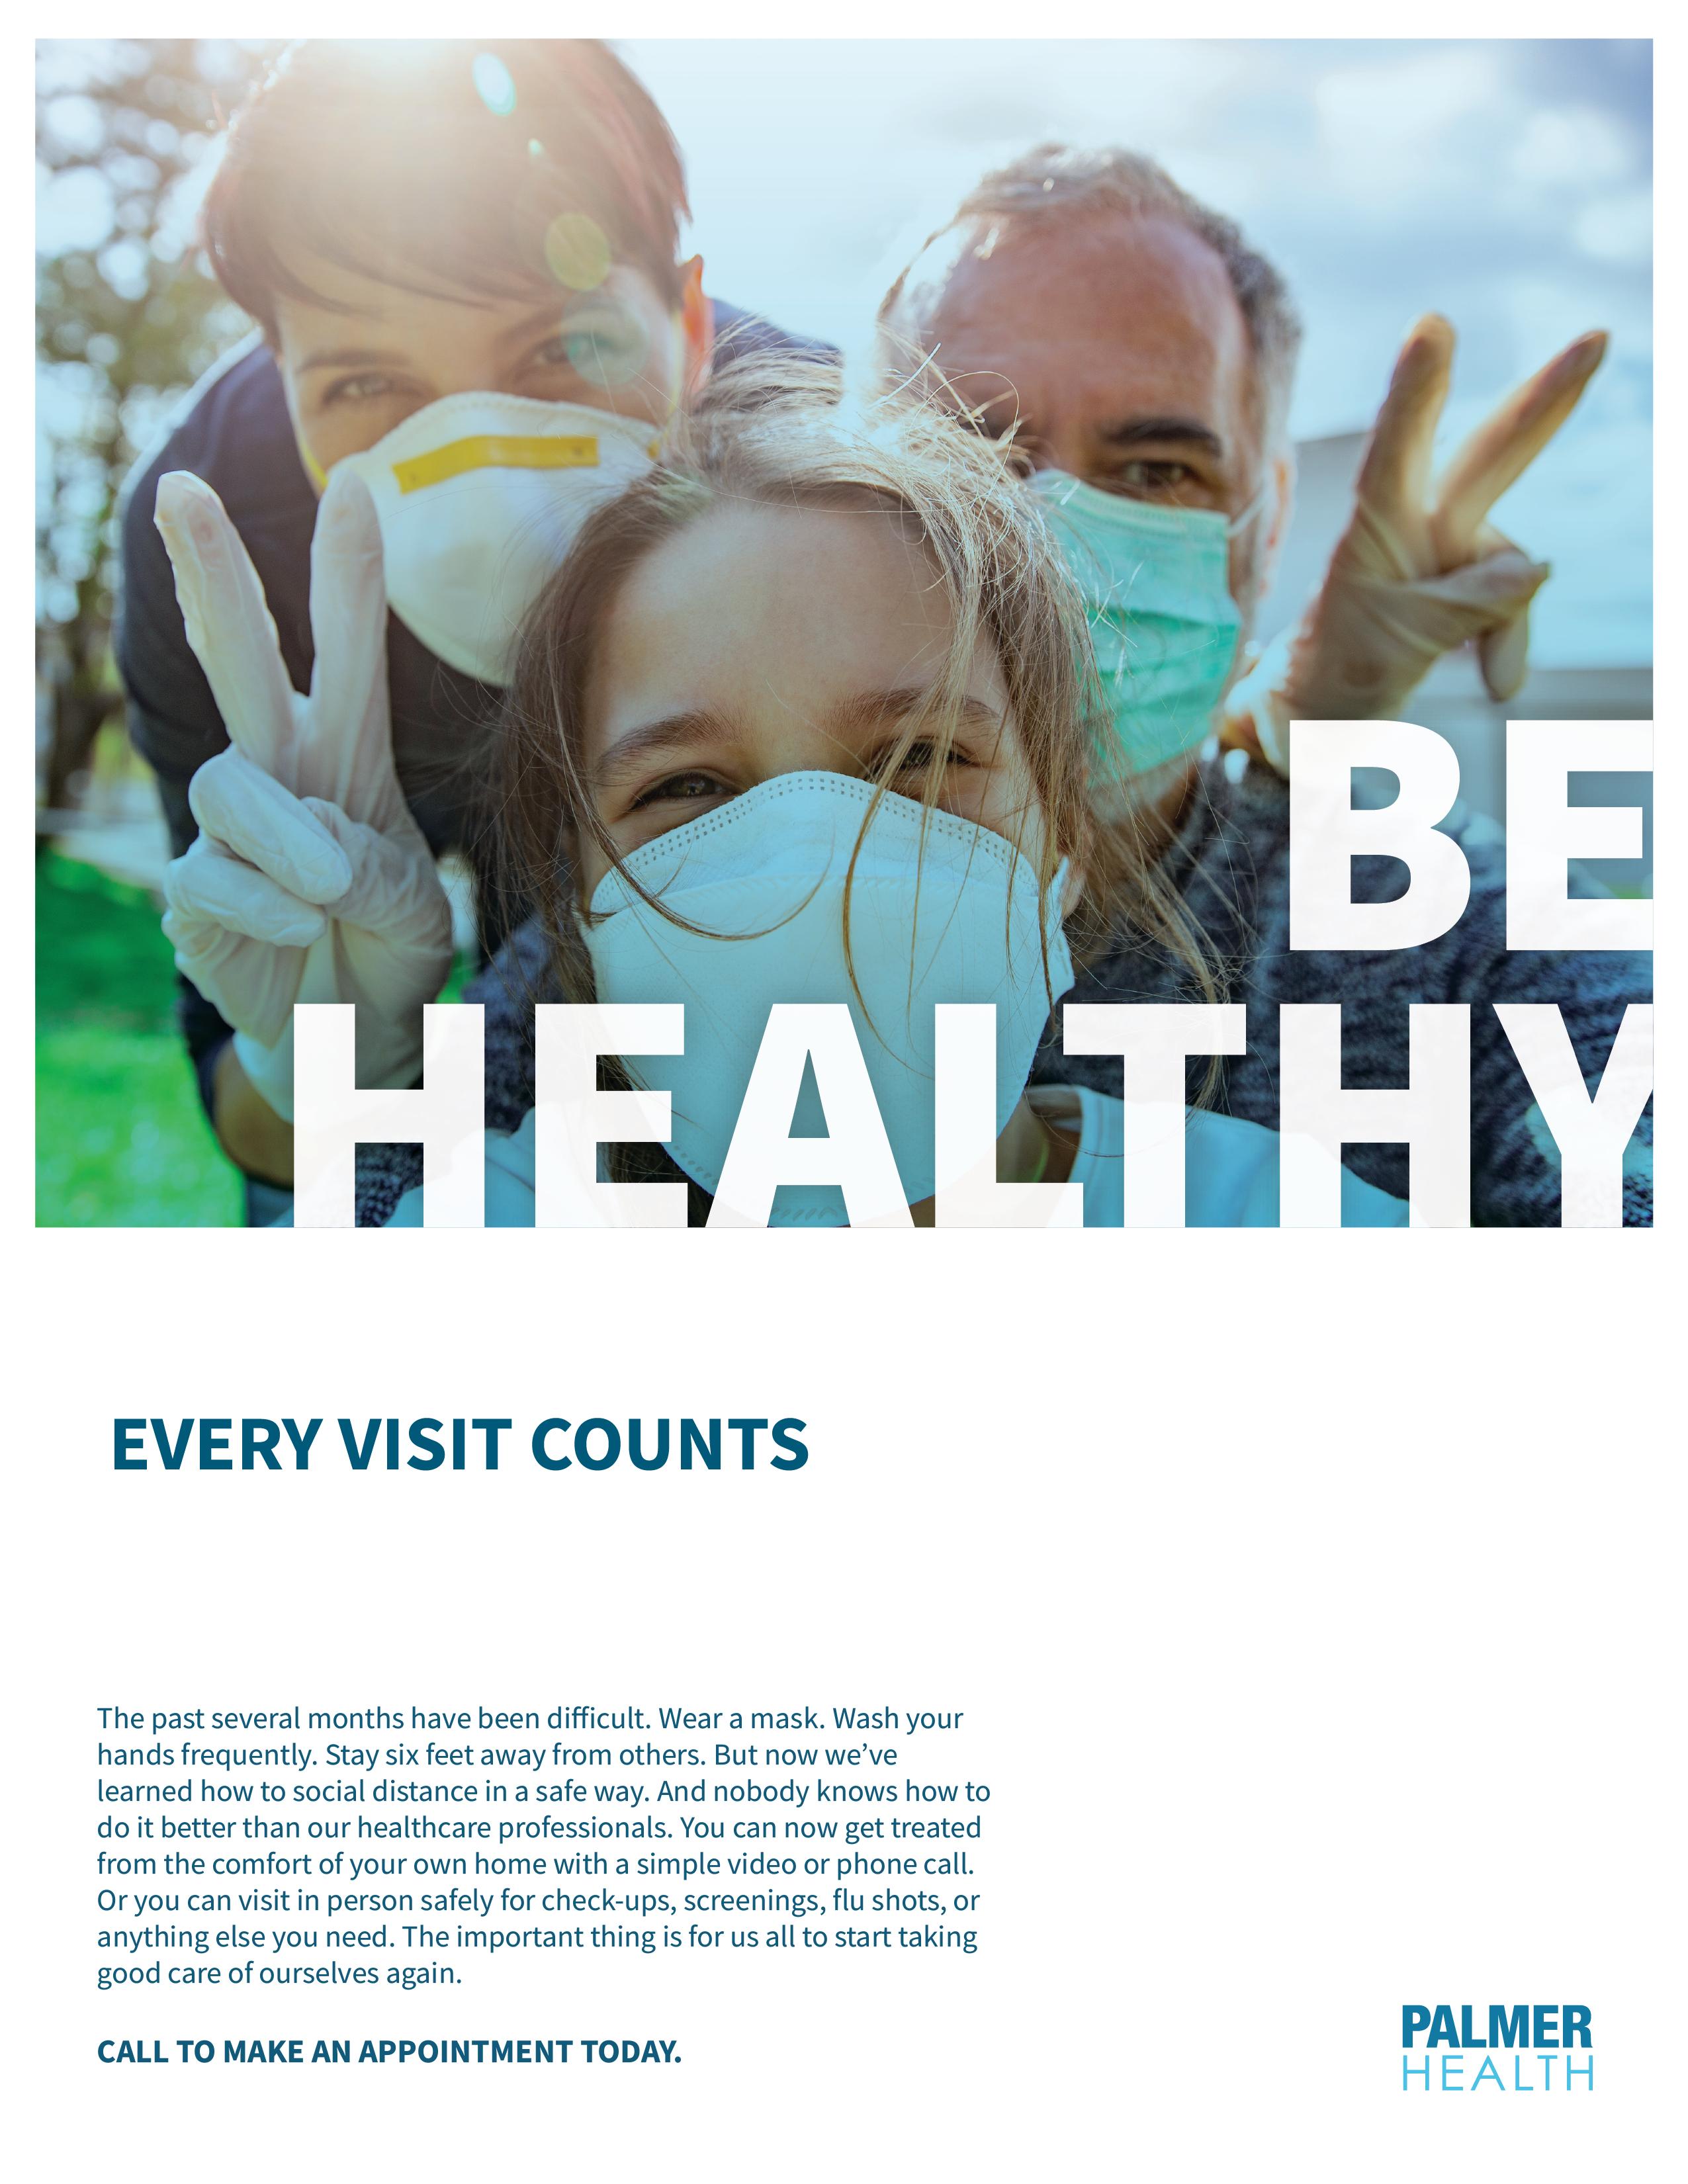 36152 Palmer health as dev for website-be  healthy-v5-aug 21-02-1